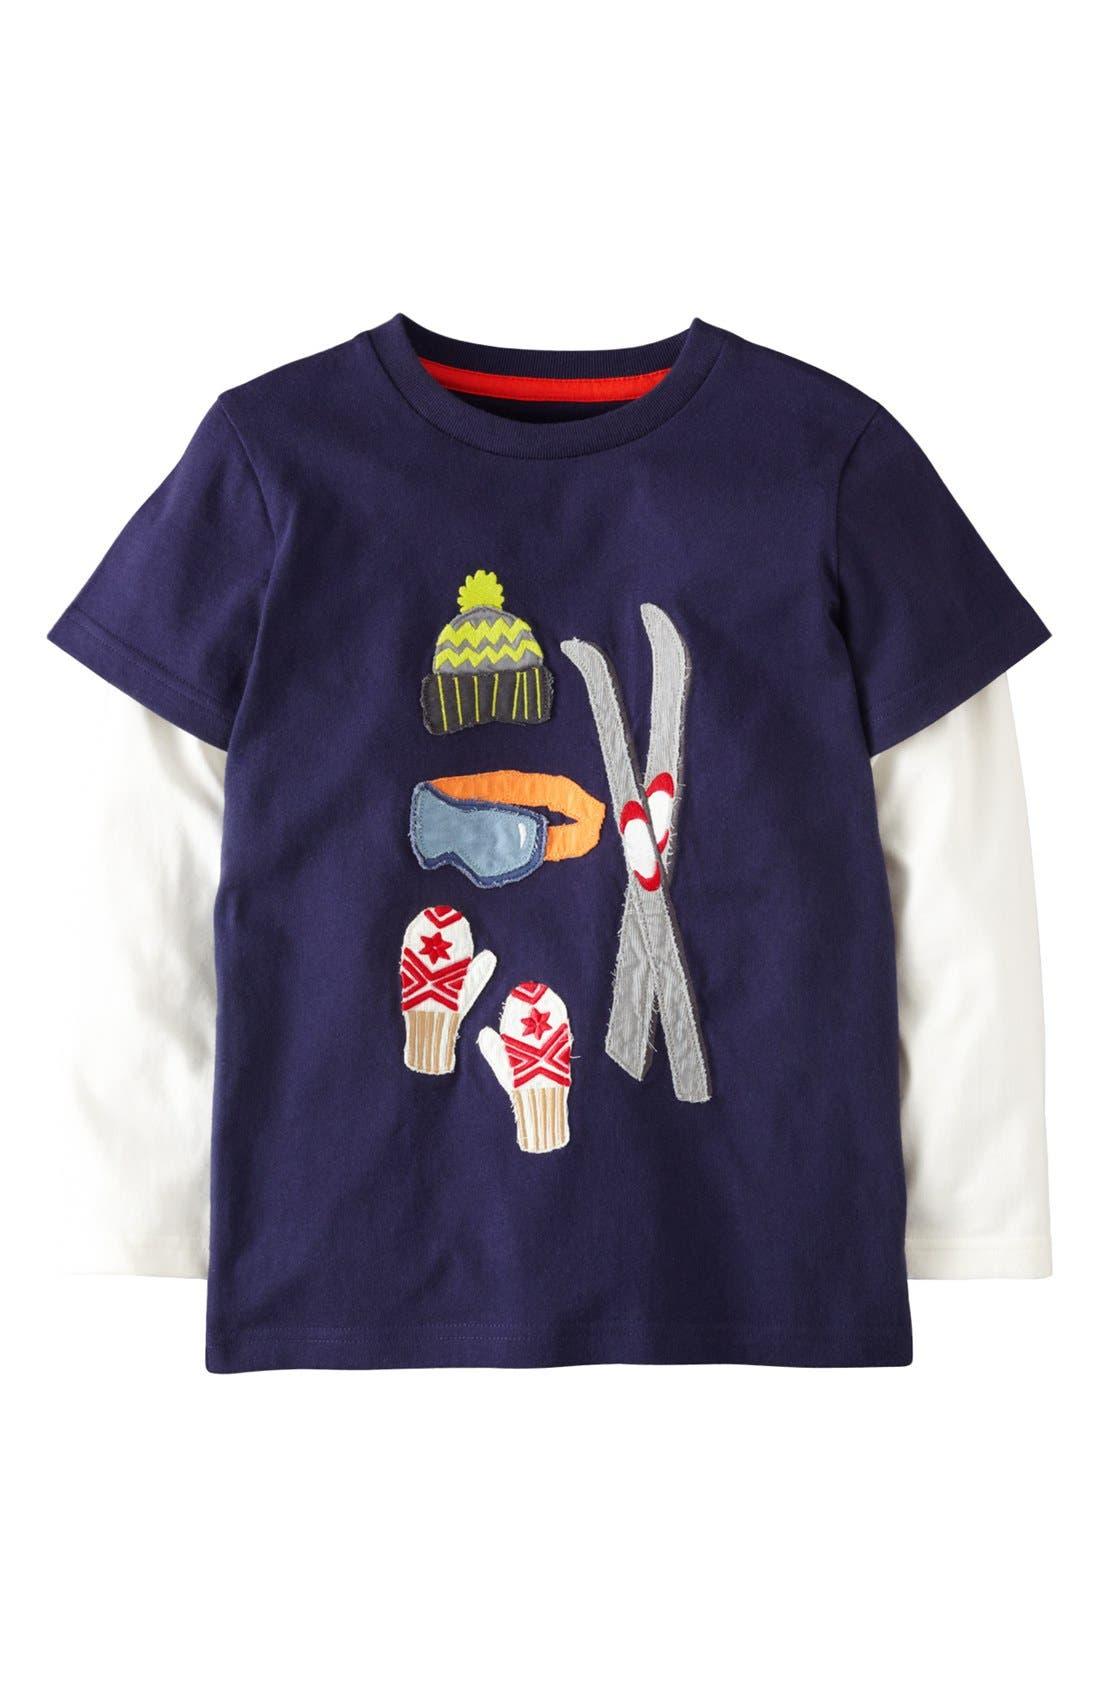 Main Image - Mini Boden 'Doing Stuff' Long Sleeve T-Shirt (Toddler Boys)